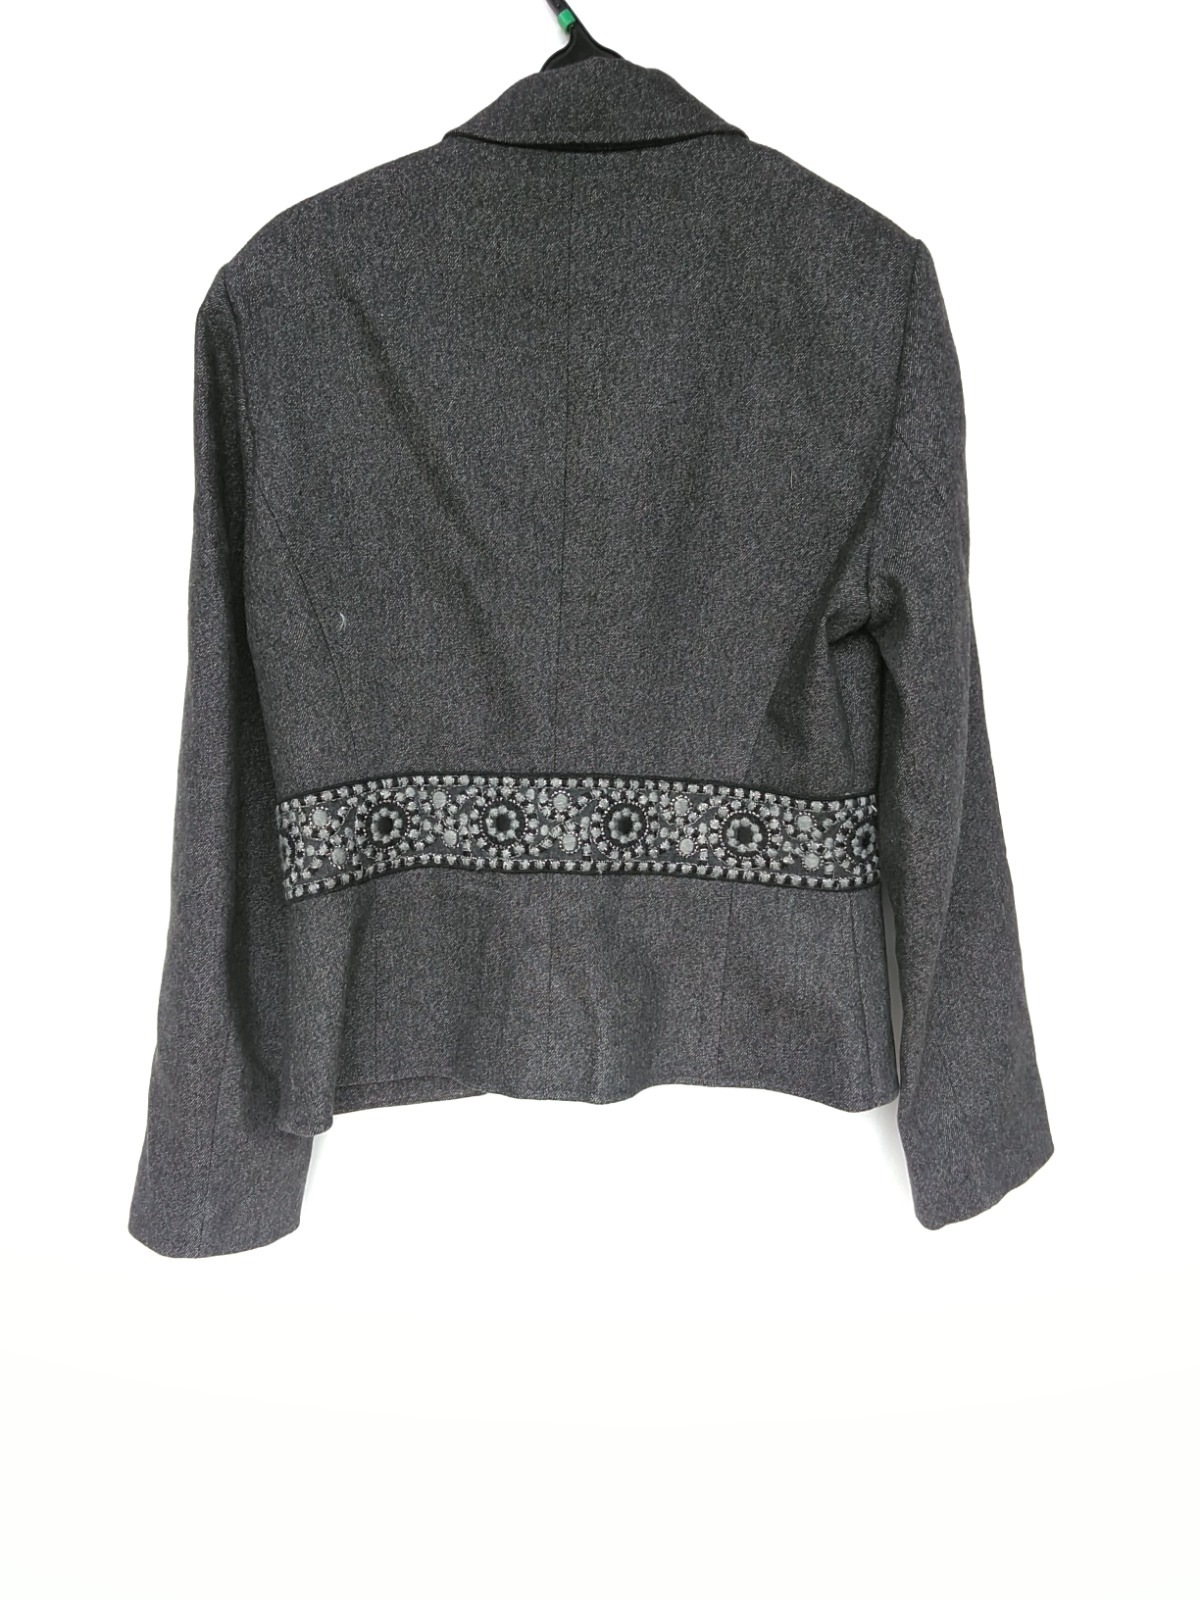 CAROLL(キャロル)のジャケット